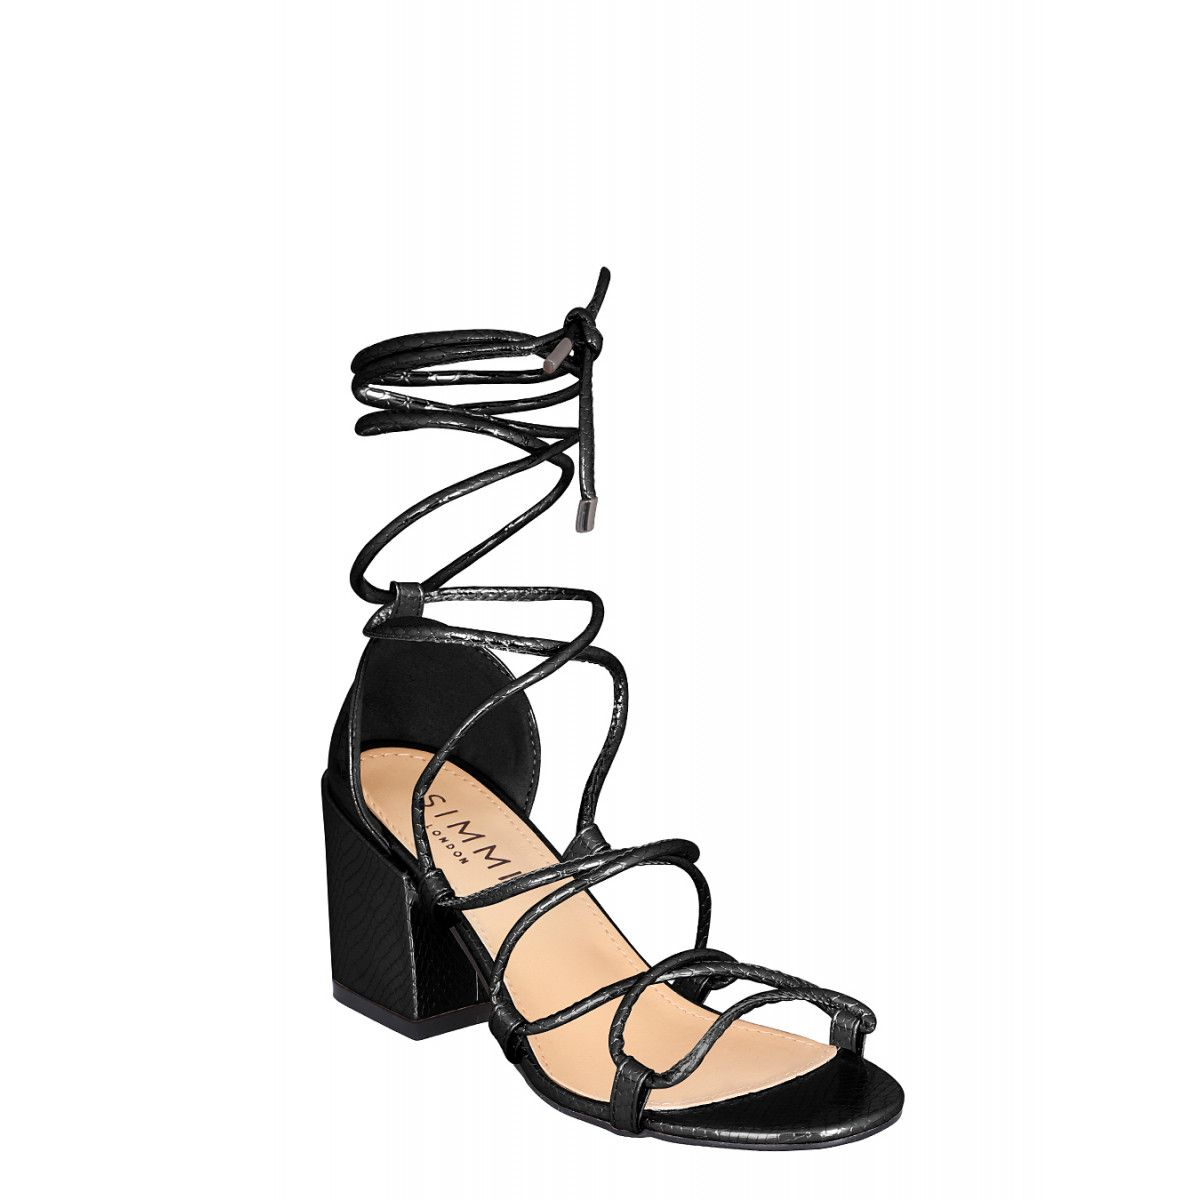 e3541683bcd Kyra Black Snake Lace Up Mid Block Heels | Wish List. Want List ...